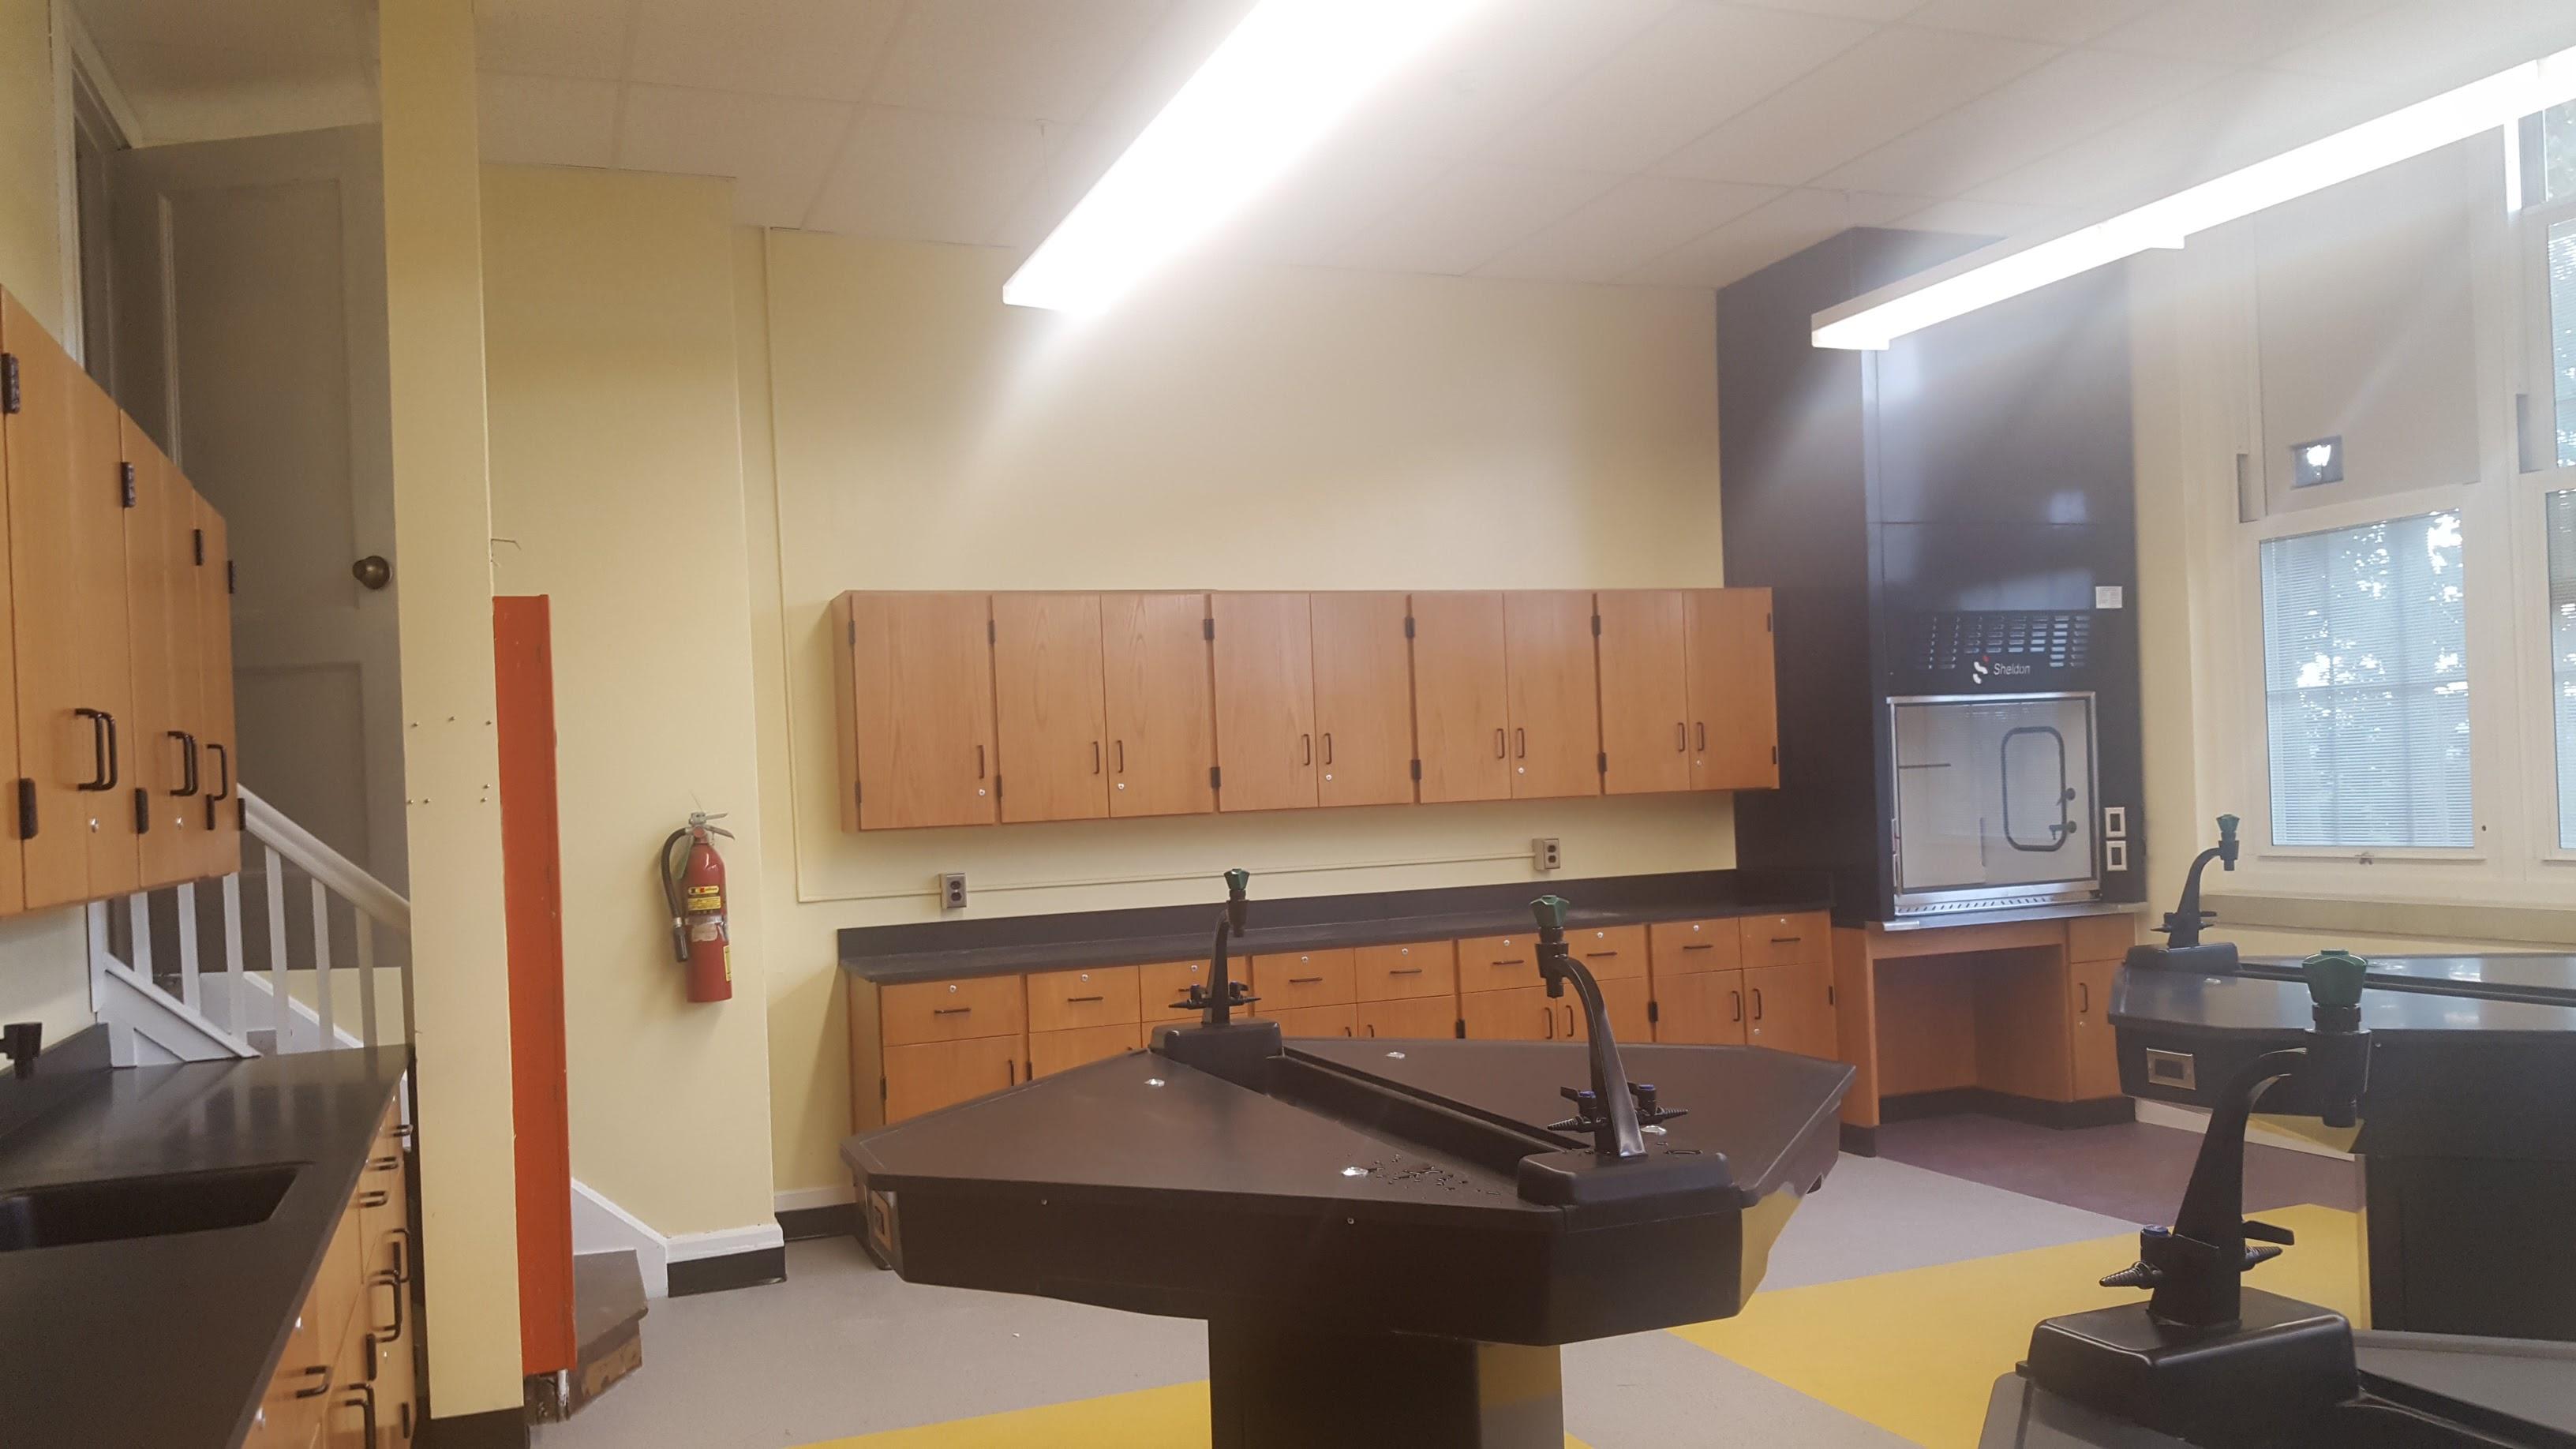 bogota nj high school chooses longo labs for chemistry lab